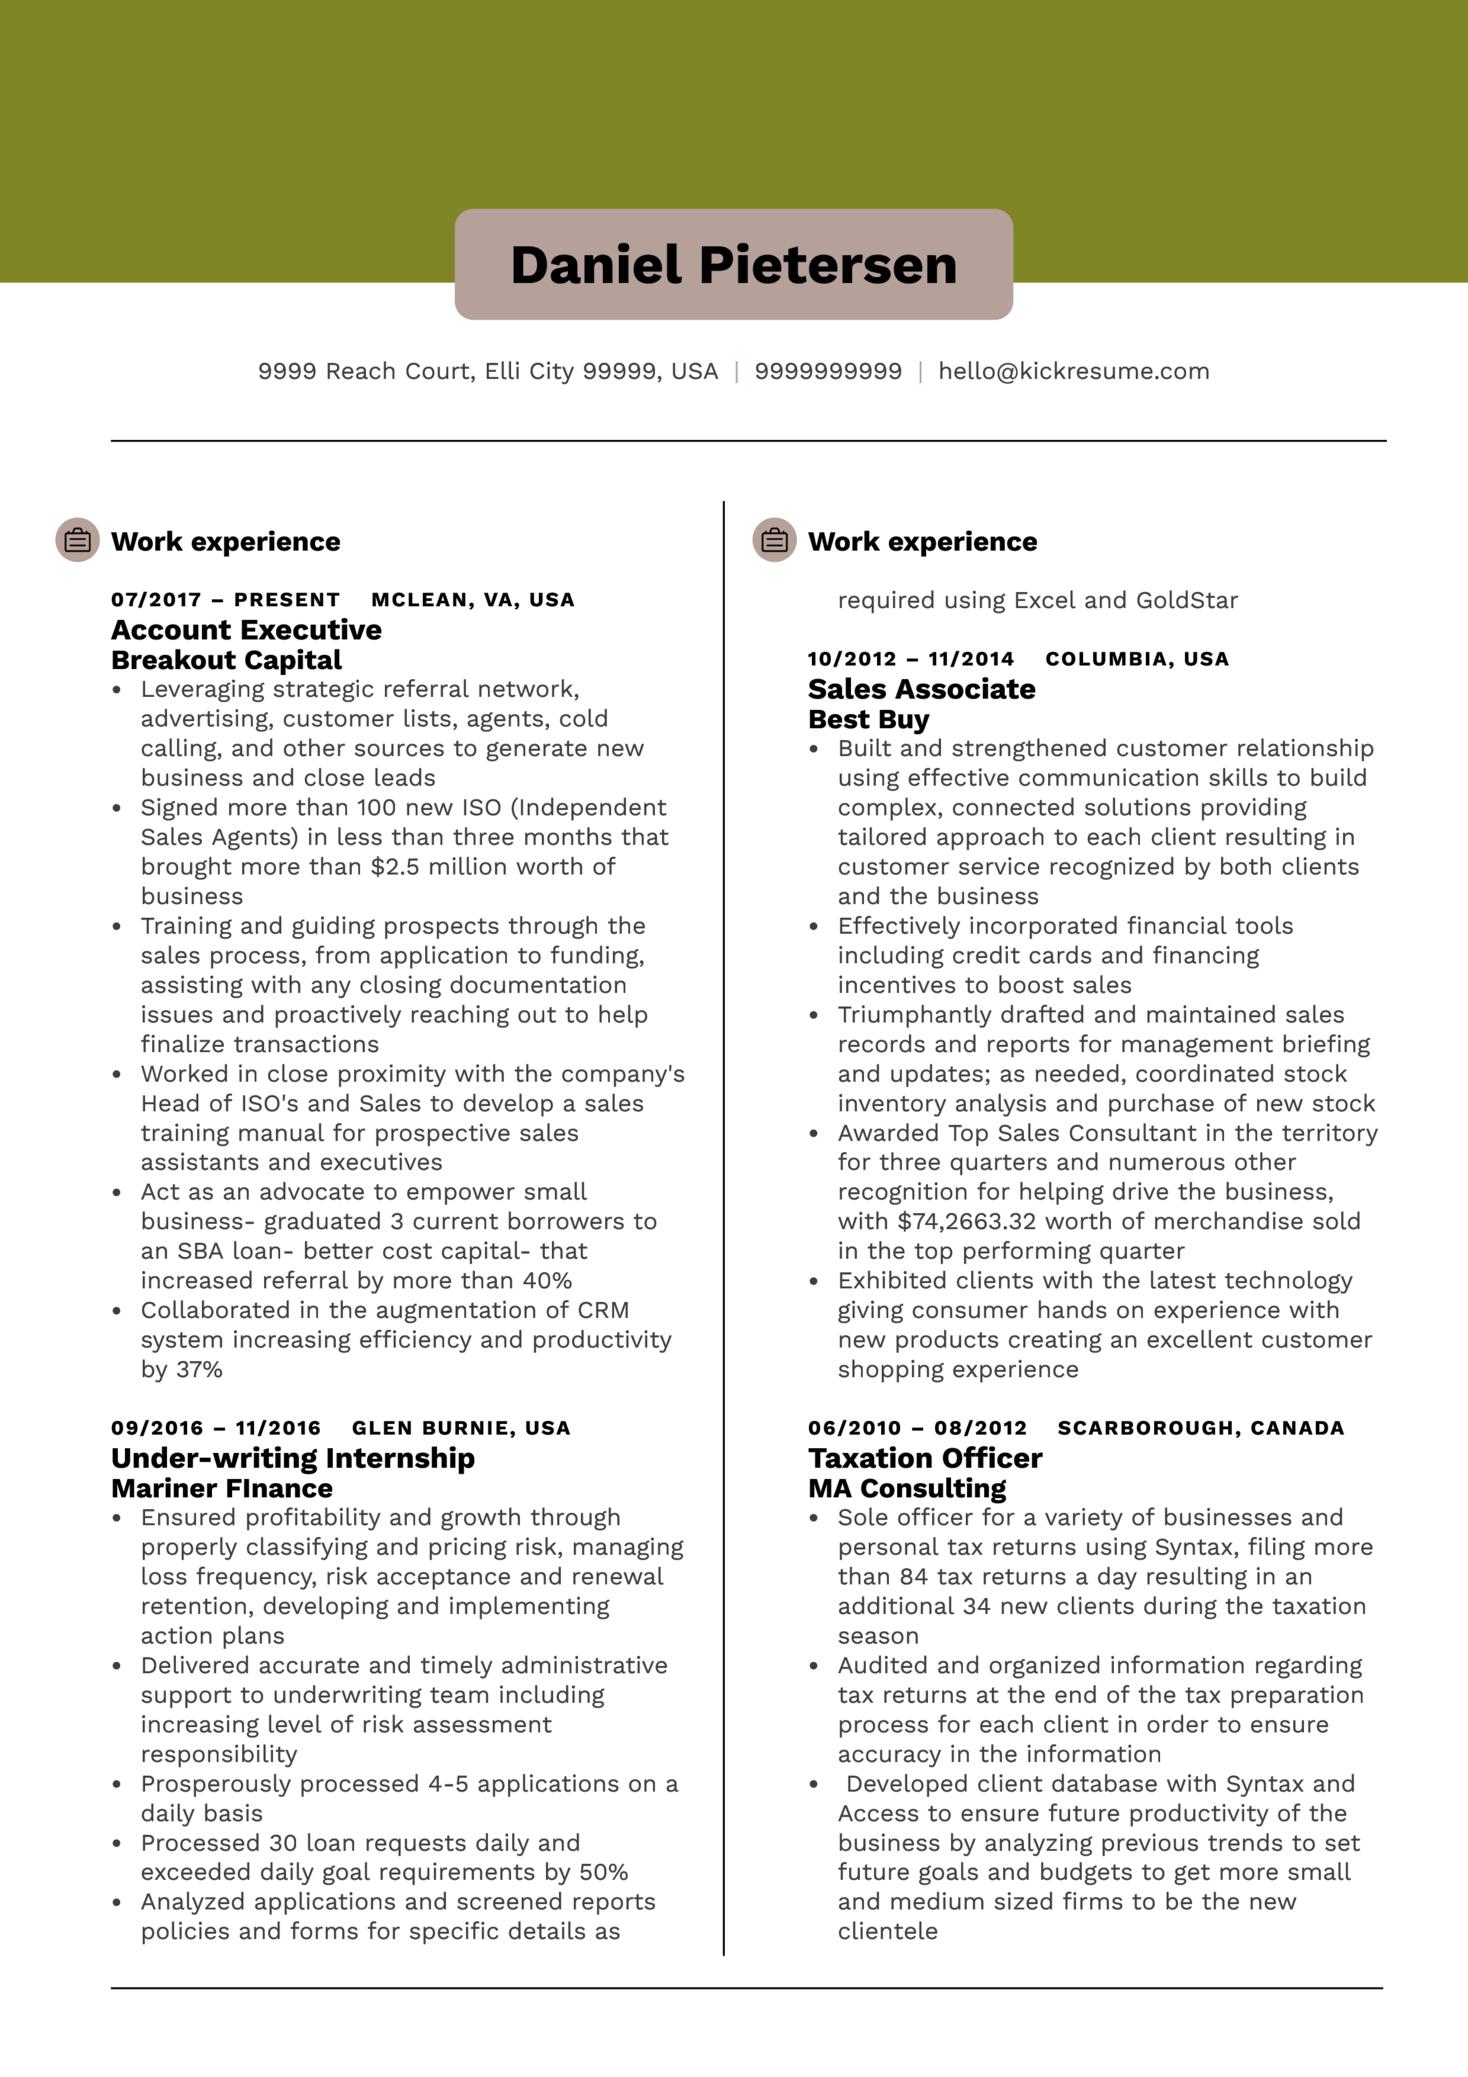 Account Executive Resume Sample (časť 1)